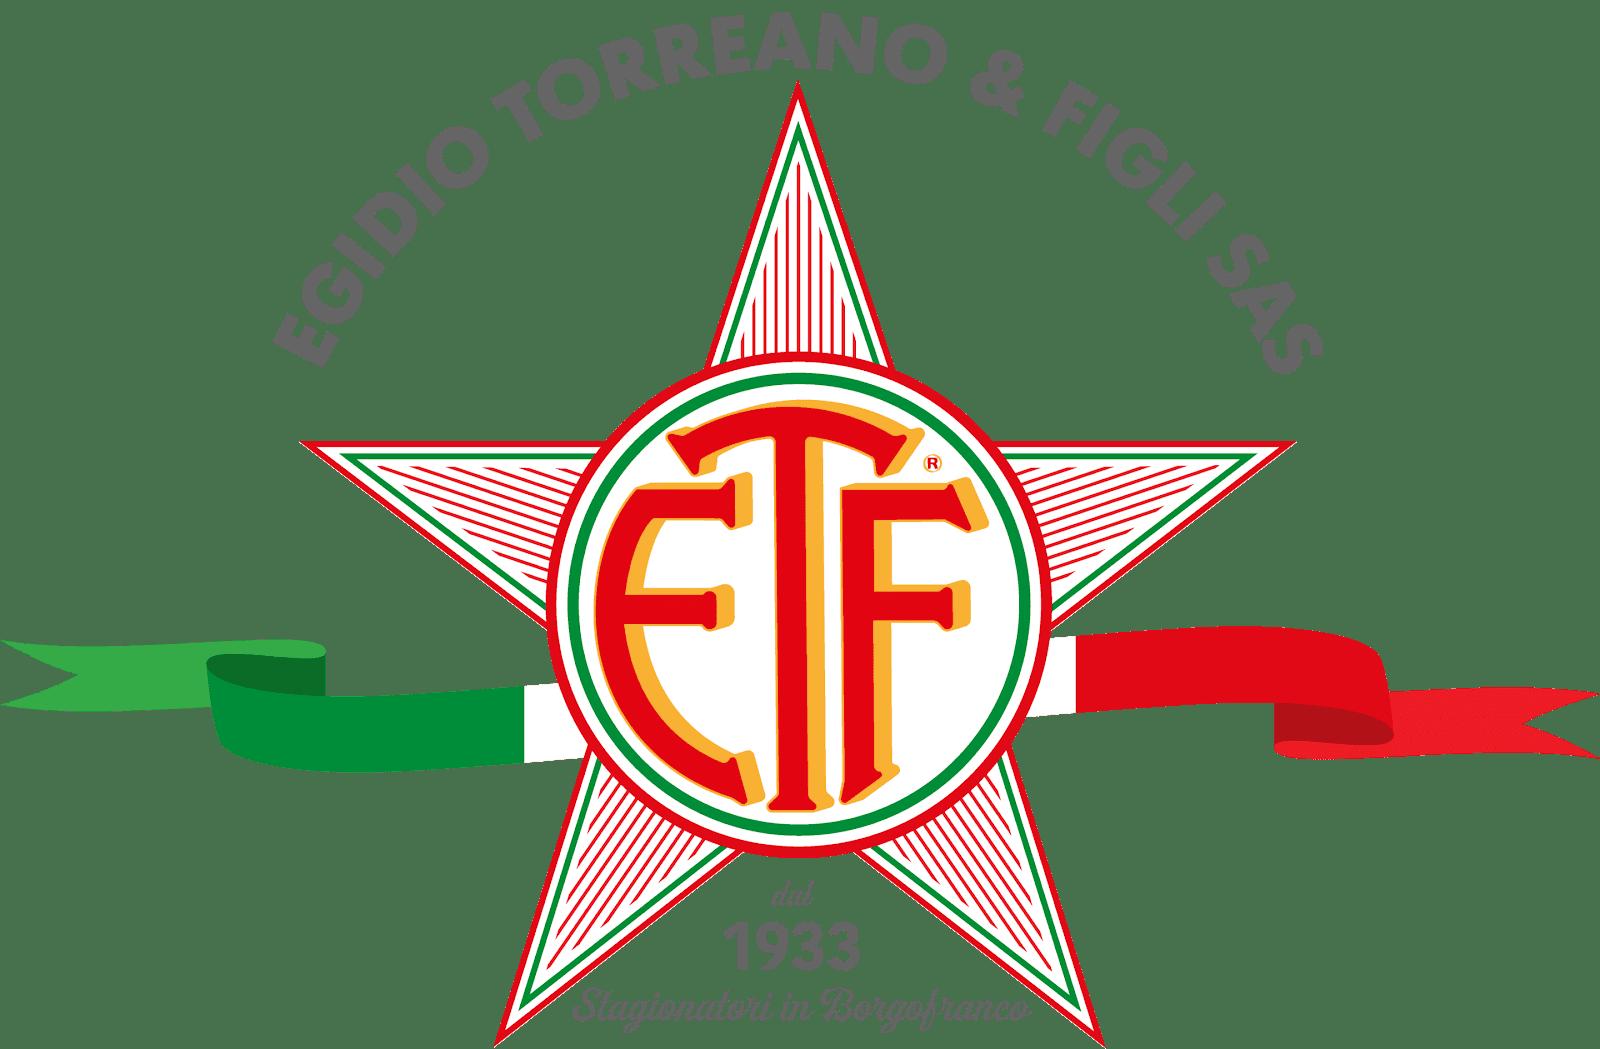 ETF Egidio Torreano & Figli